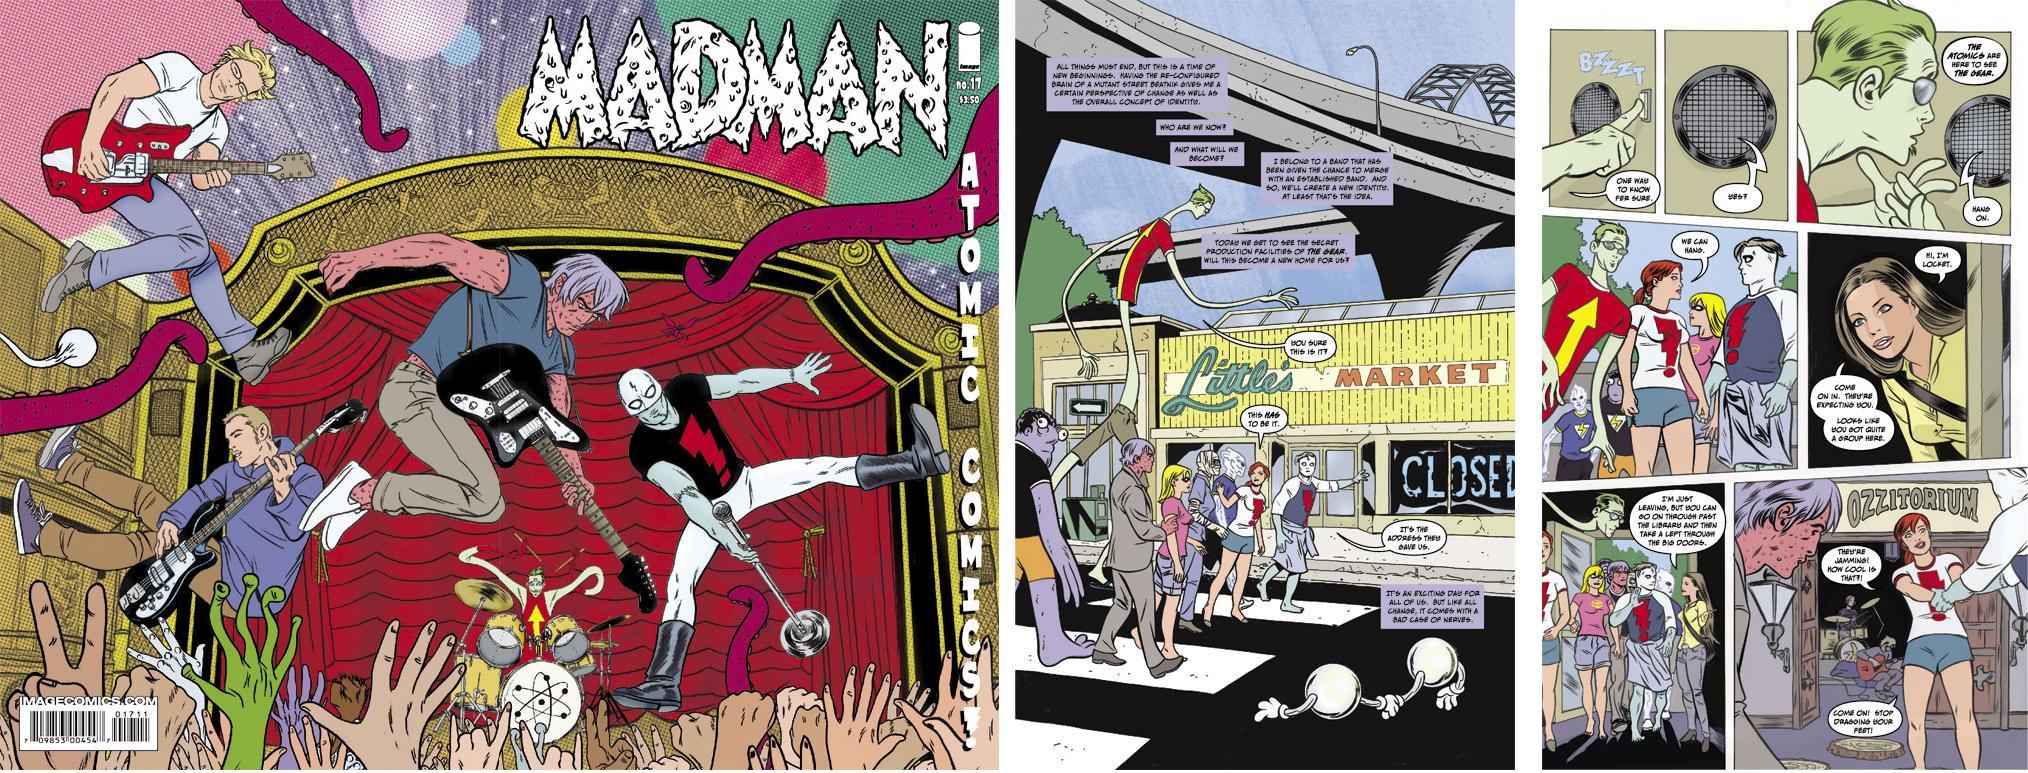 Logan Paul Red Challenger >> AICN COMICS STM Previews TITANIUM RAIN! DARKNESS/PITT! SPIDER-WOMAN! MADMAN! ATOMIC ROBO! OLD MAN...